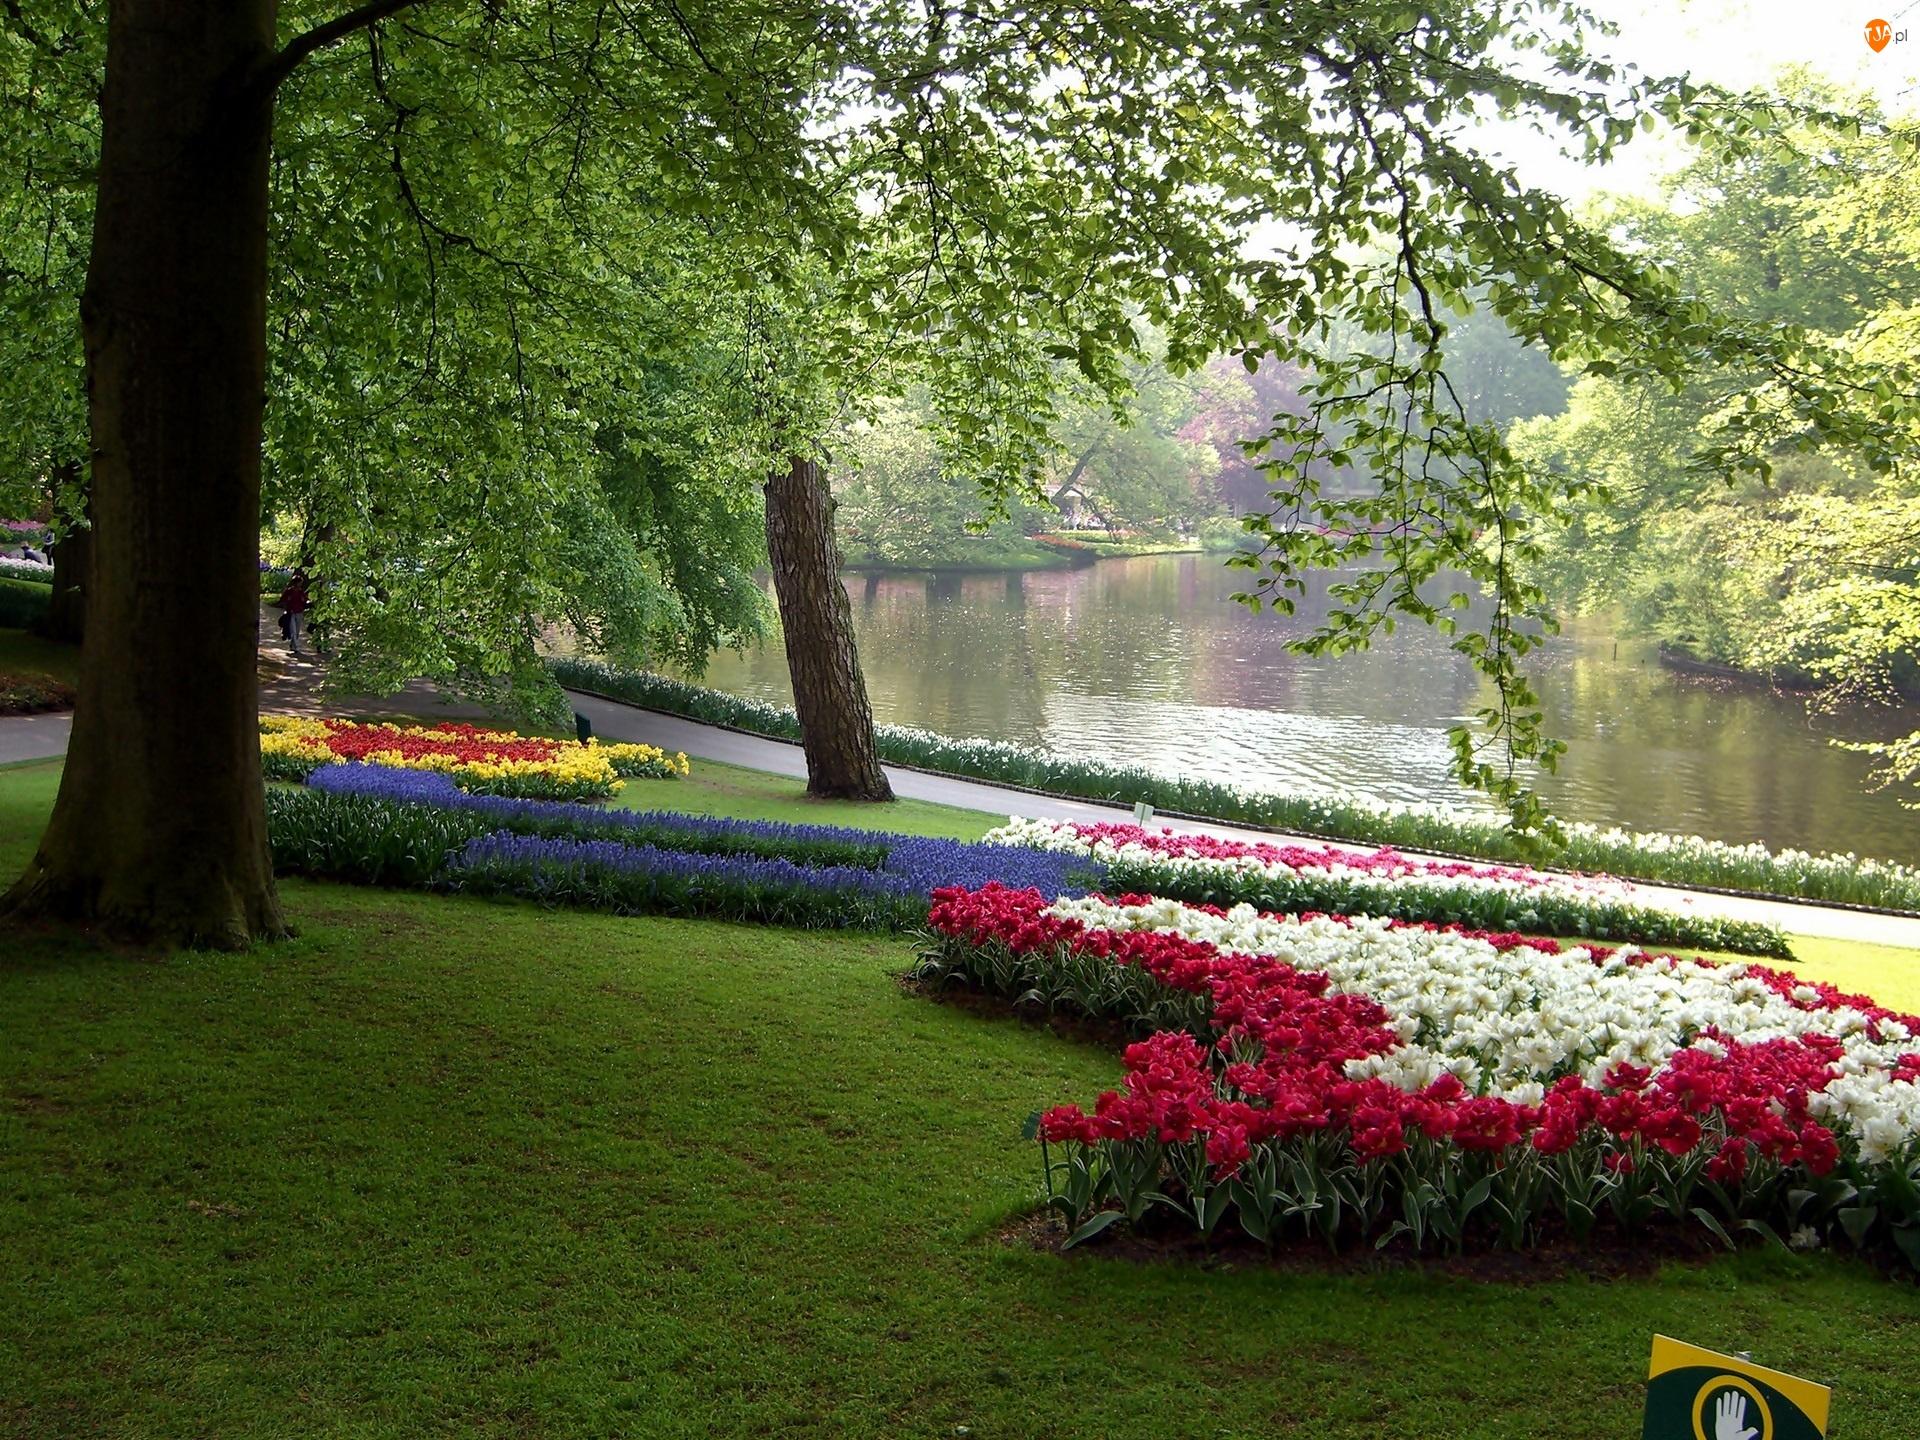 Lisse, Kwitnące, Park, Kwiaty, Kaukenhof, Wiosna